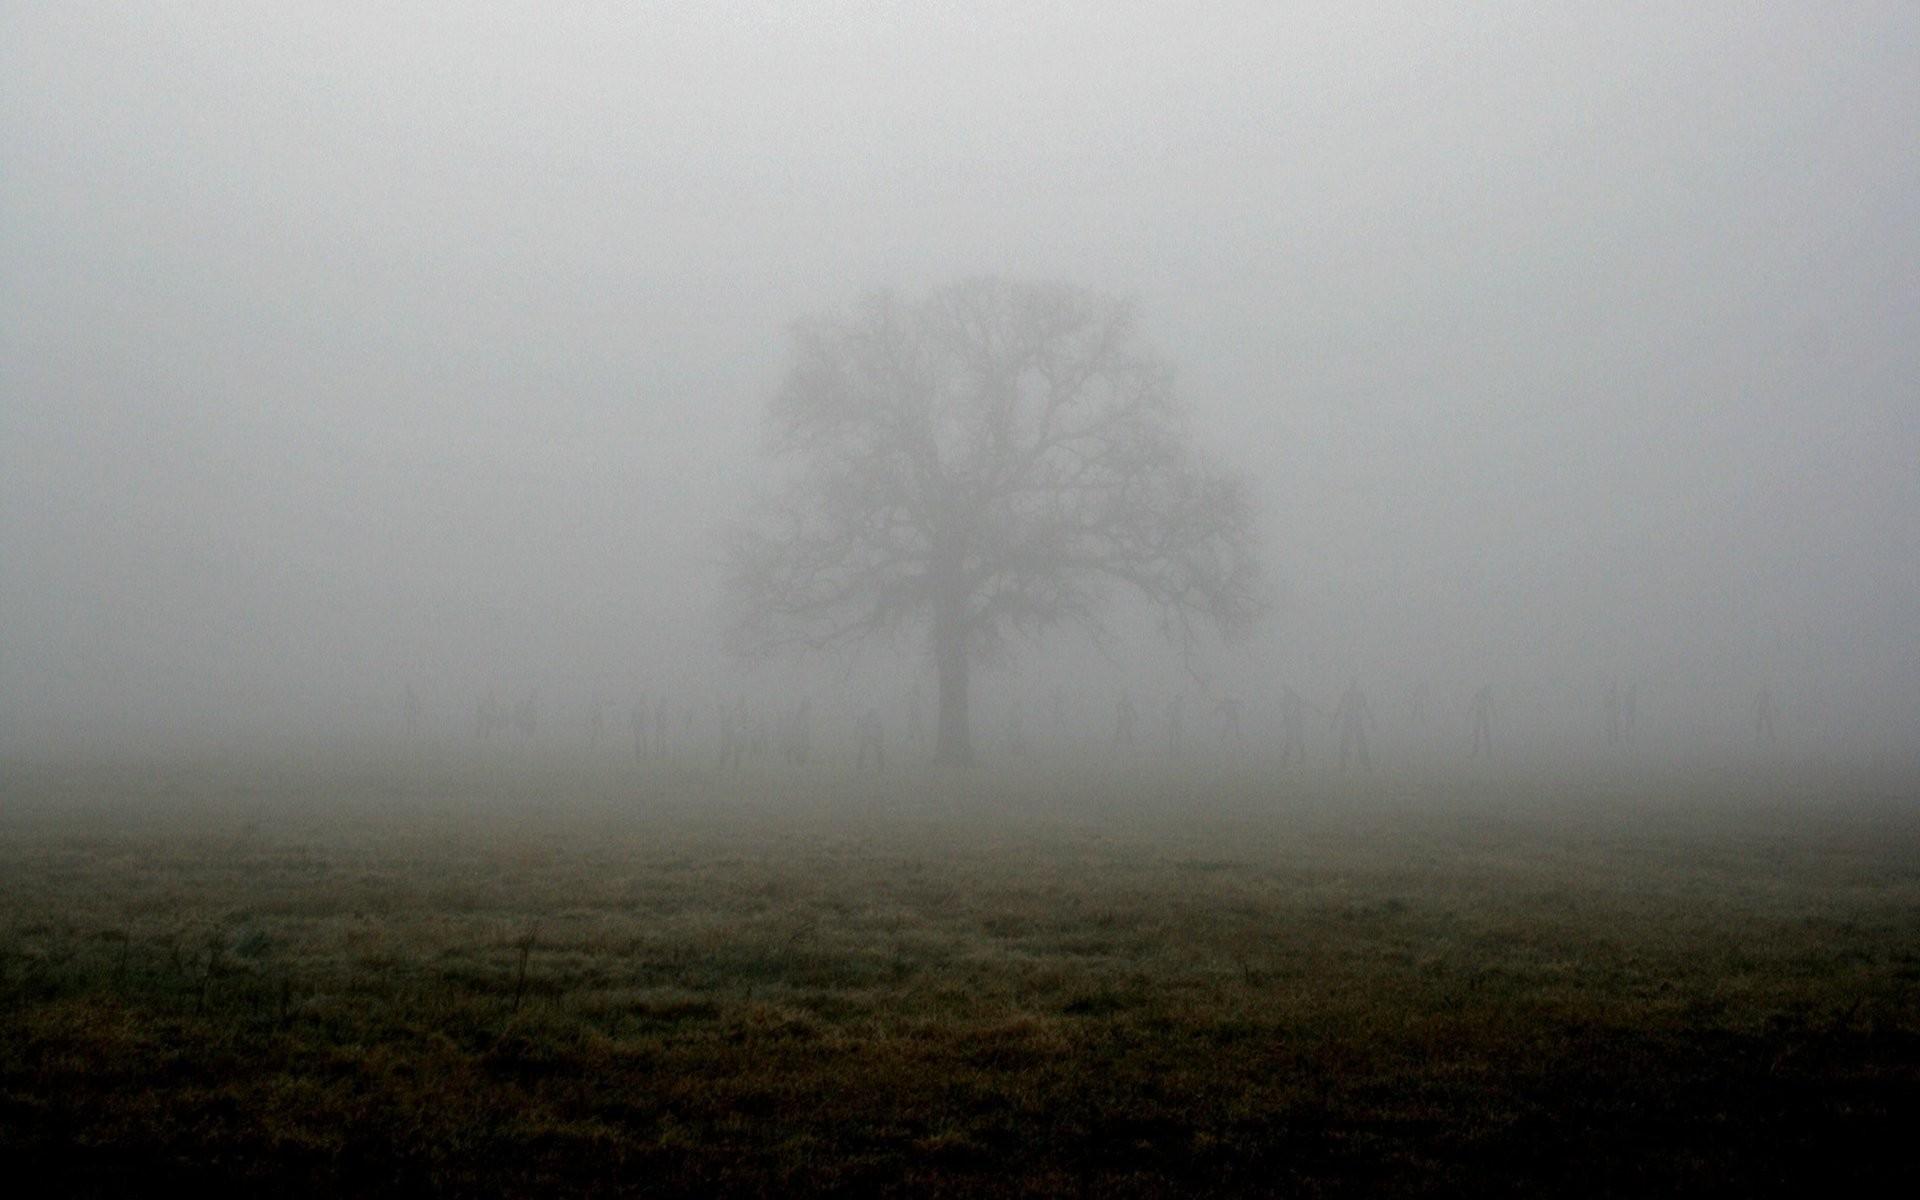 Horror, Scary, Creepy,dark, Evil, Hd Art Wallpapers, - Fog - HD Wallpaper